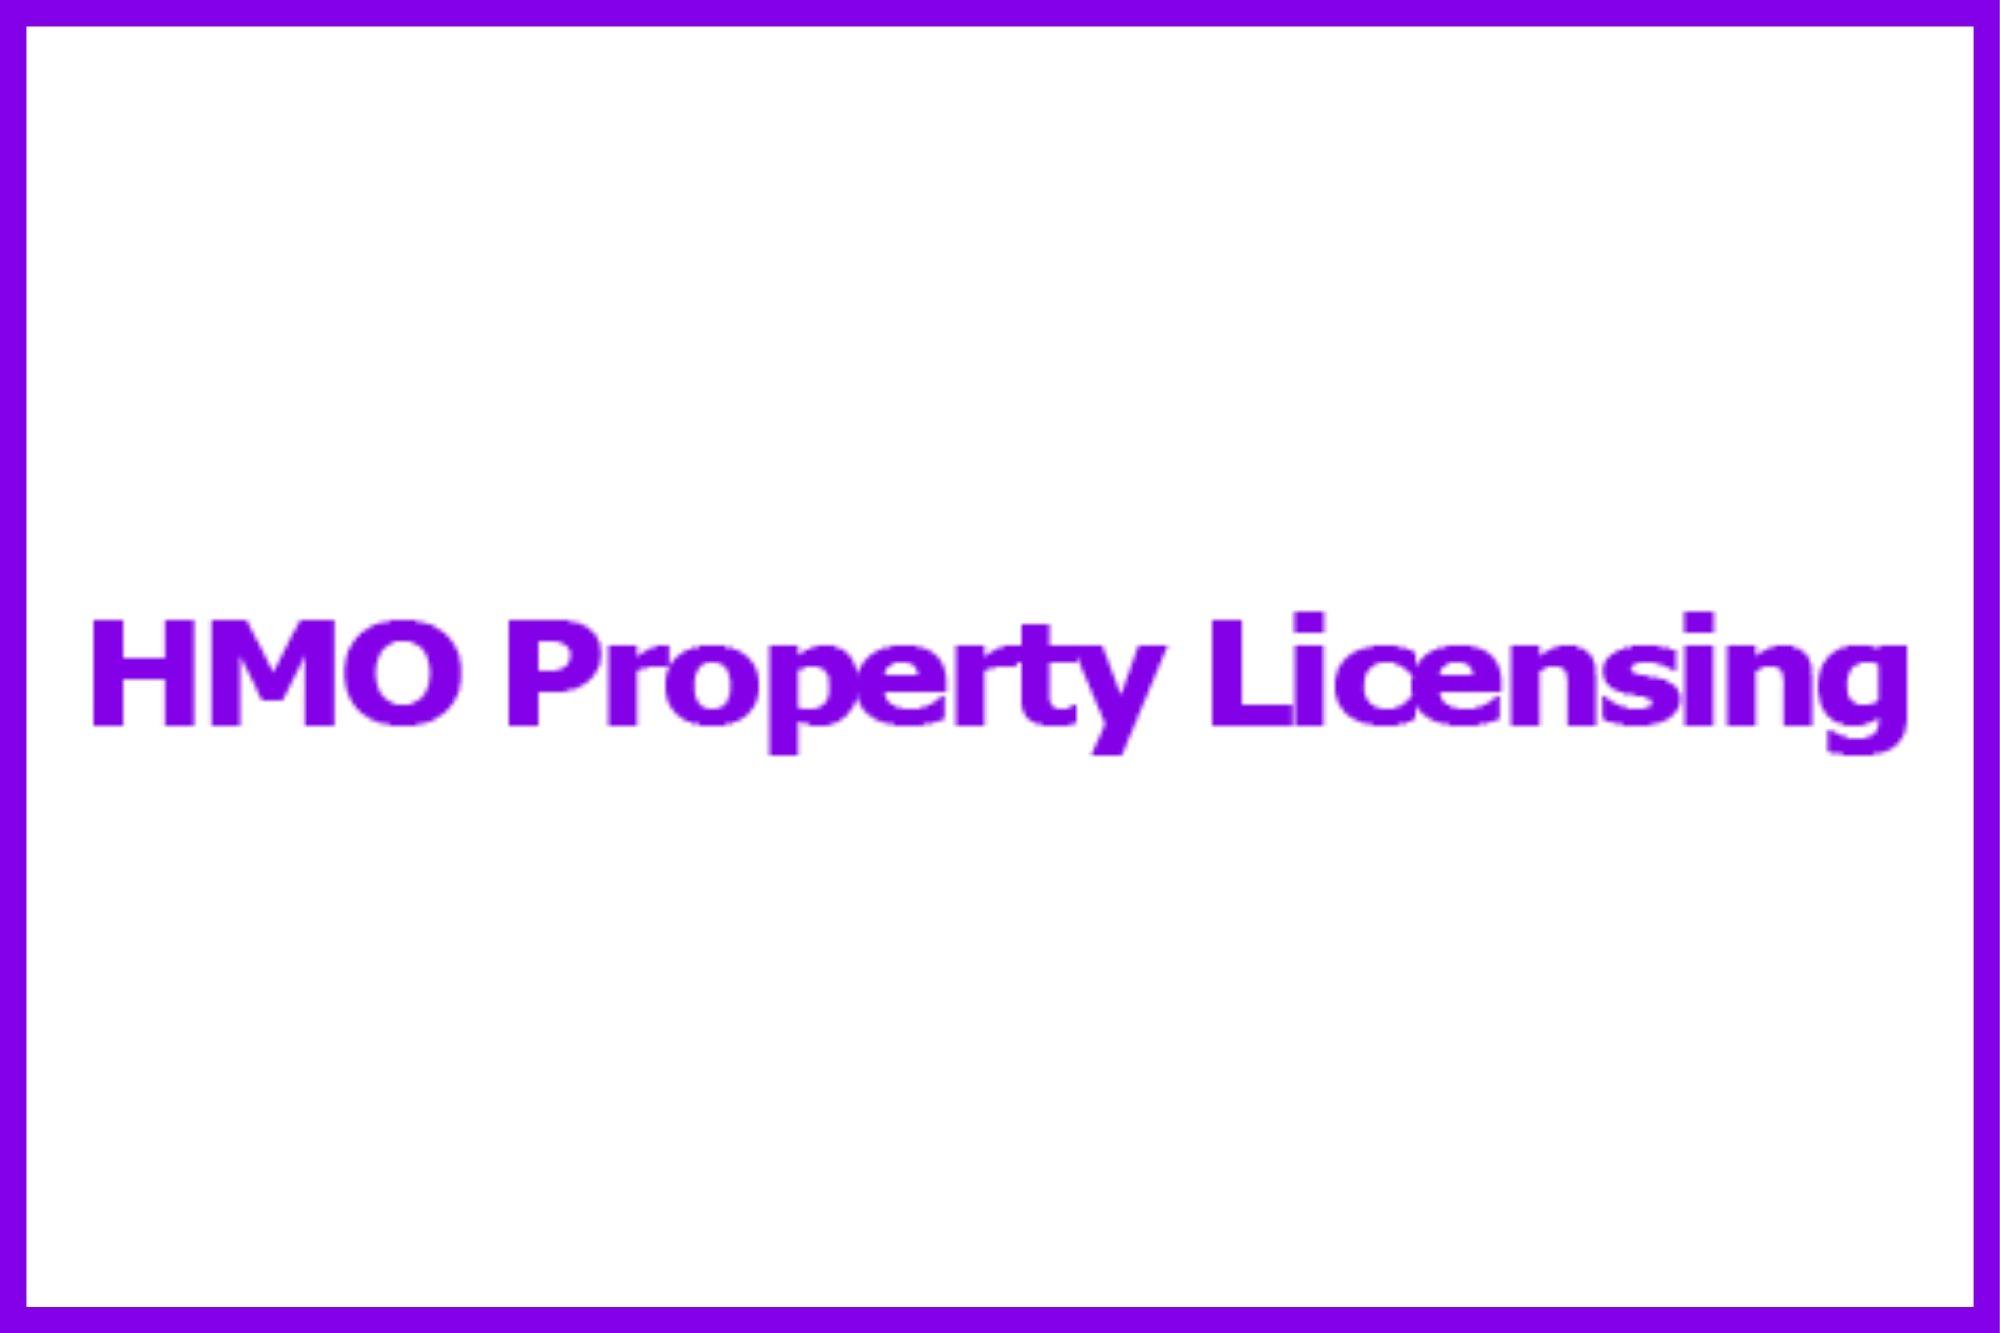 HMO Property Licensing2